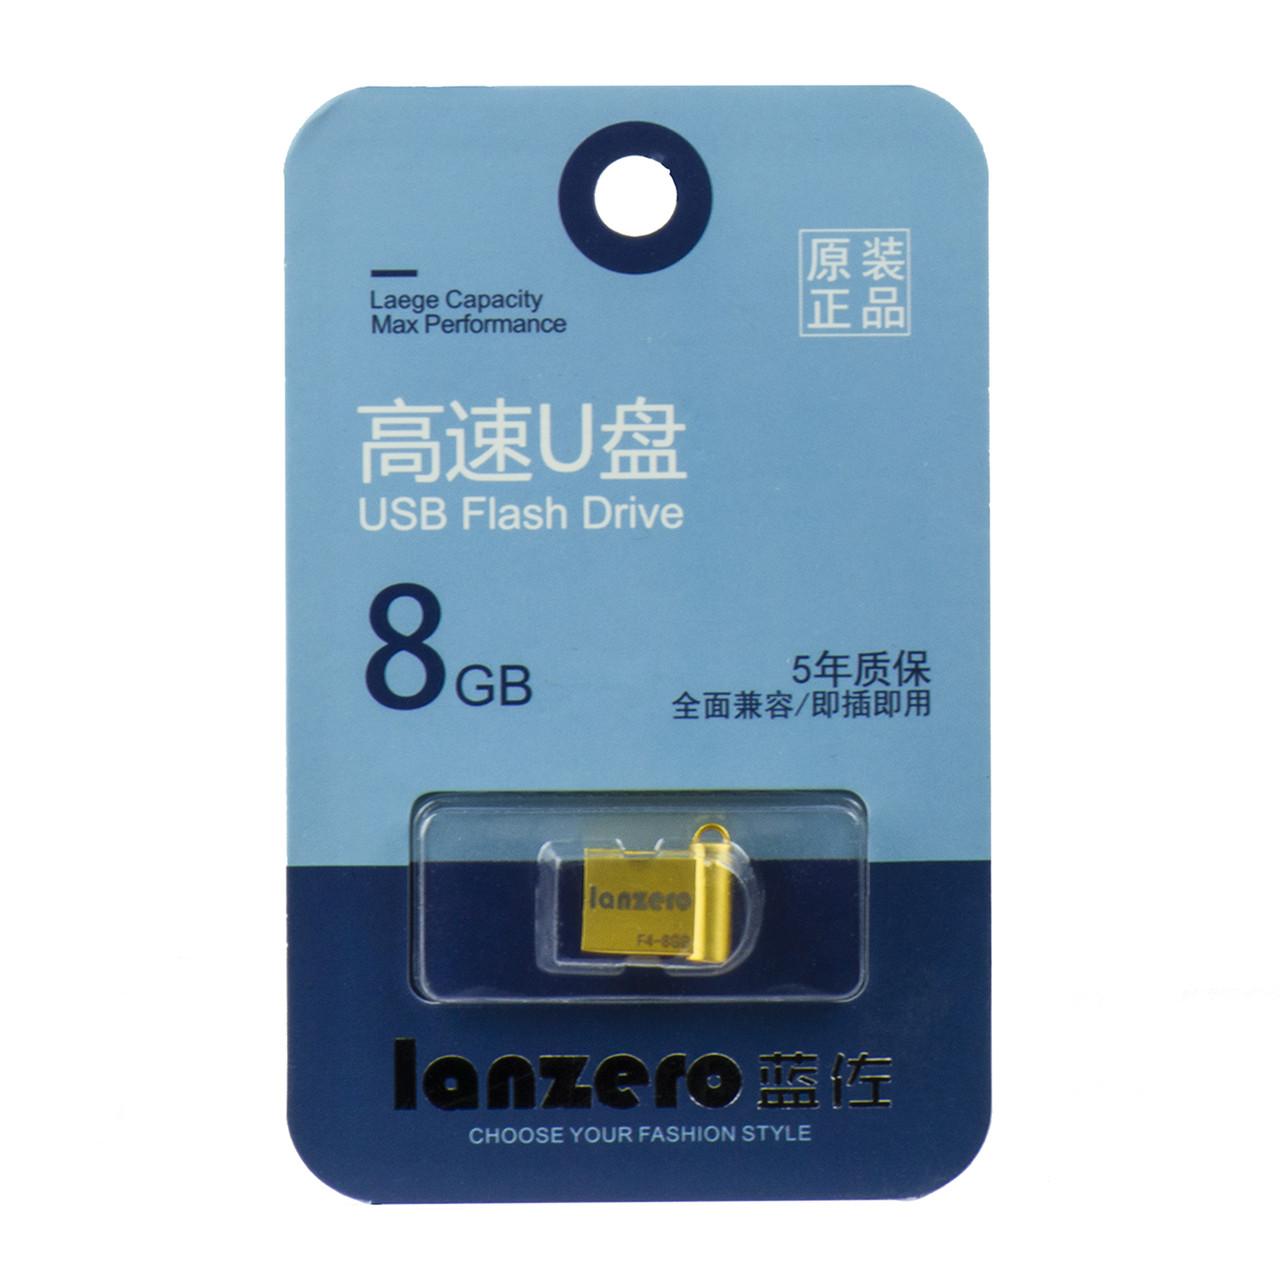 USB Flash 8Gb Lanzero mini F4, Gold